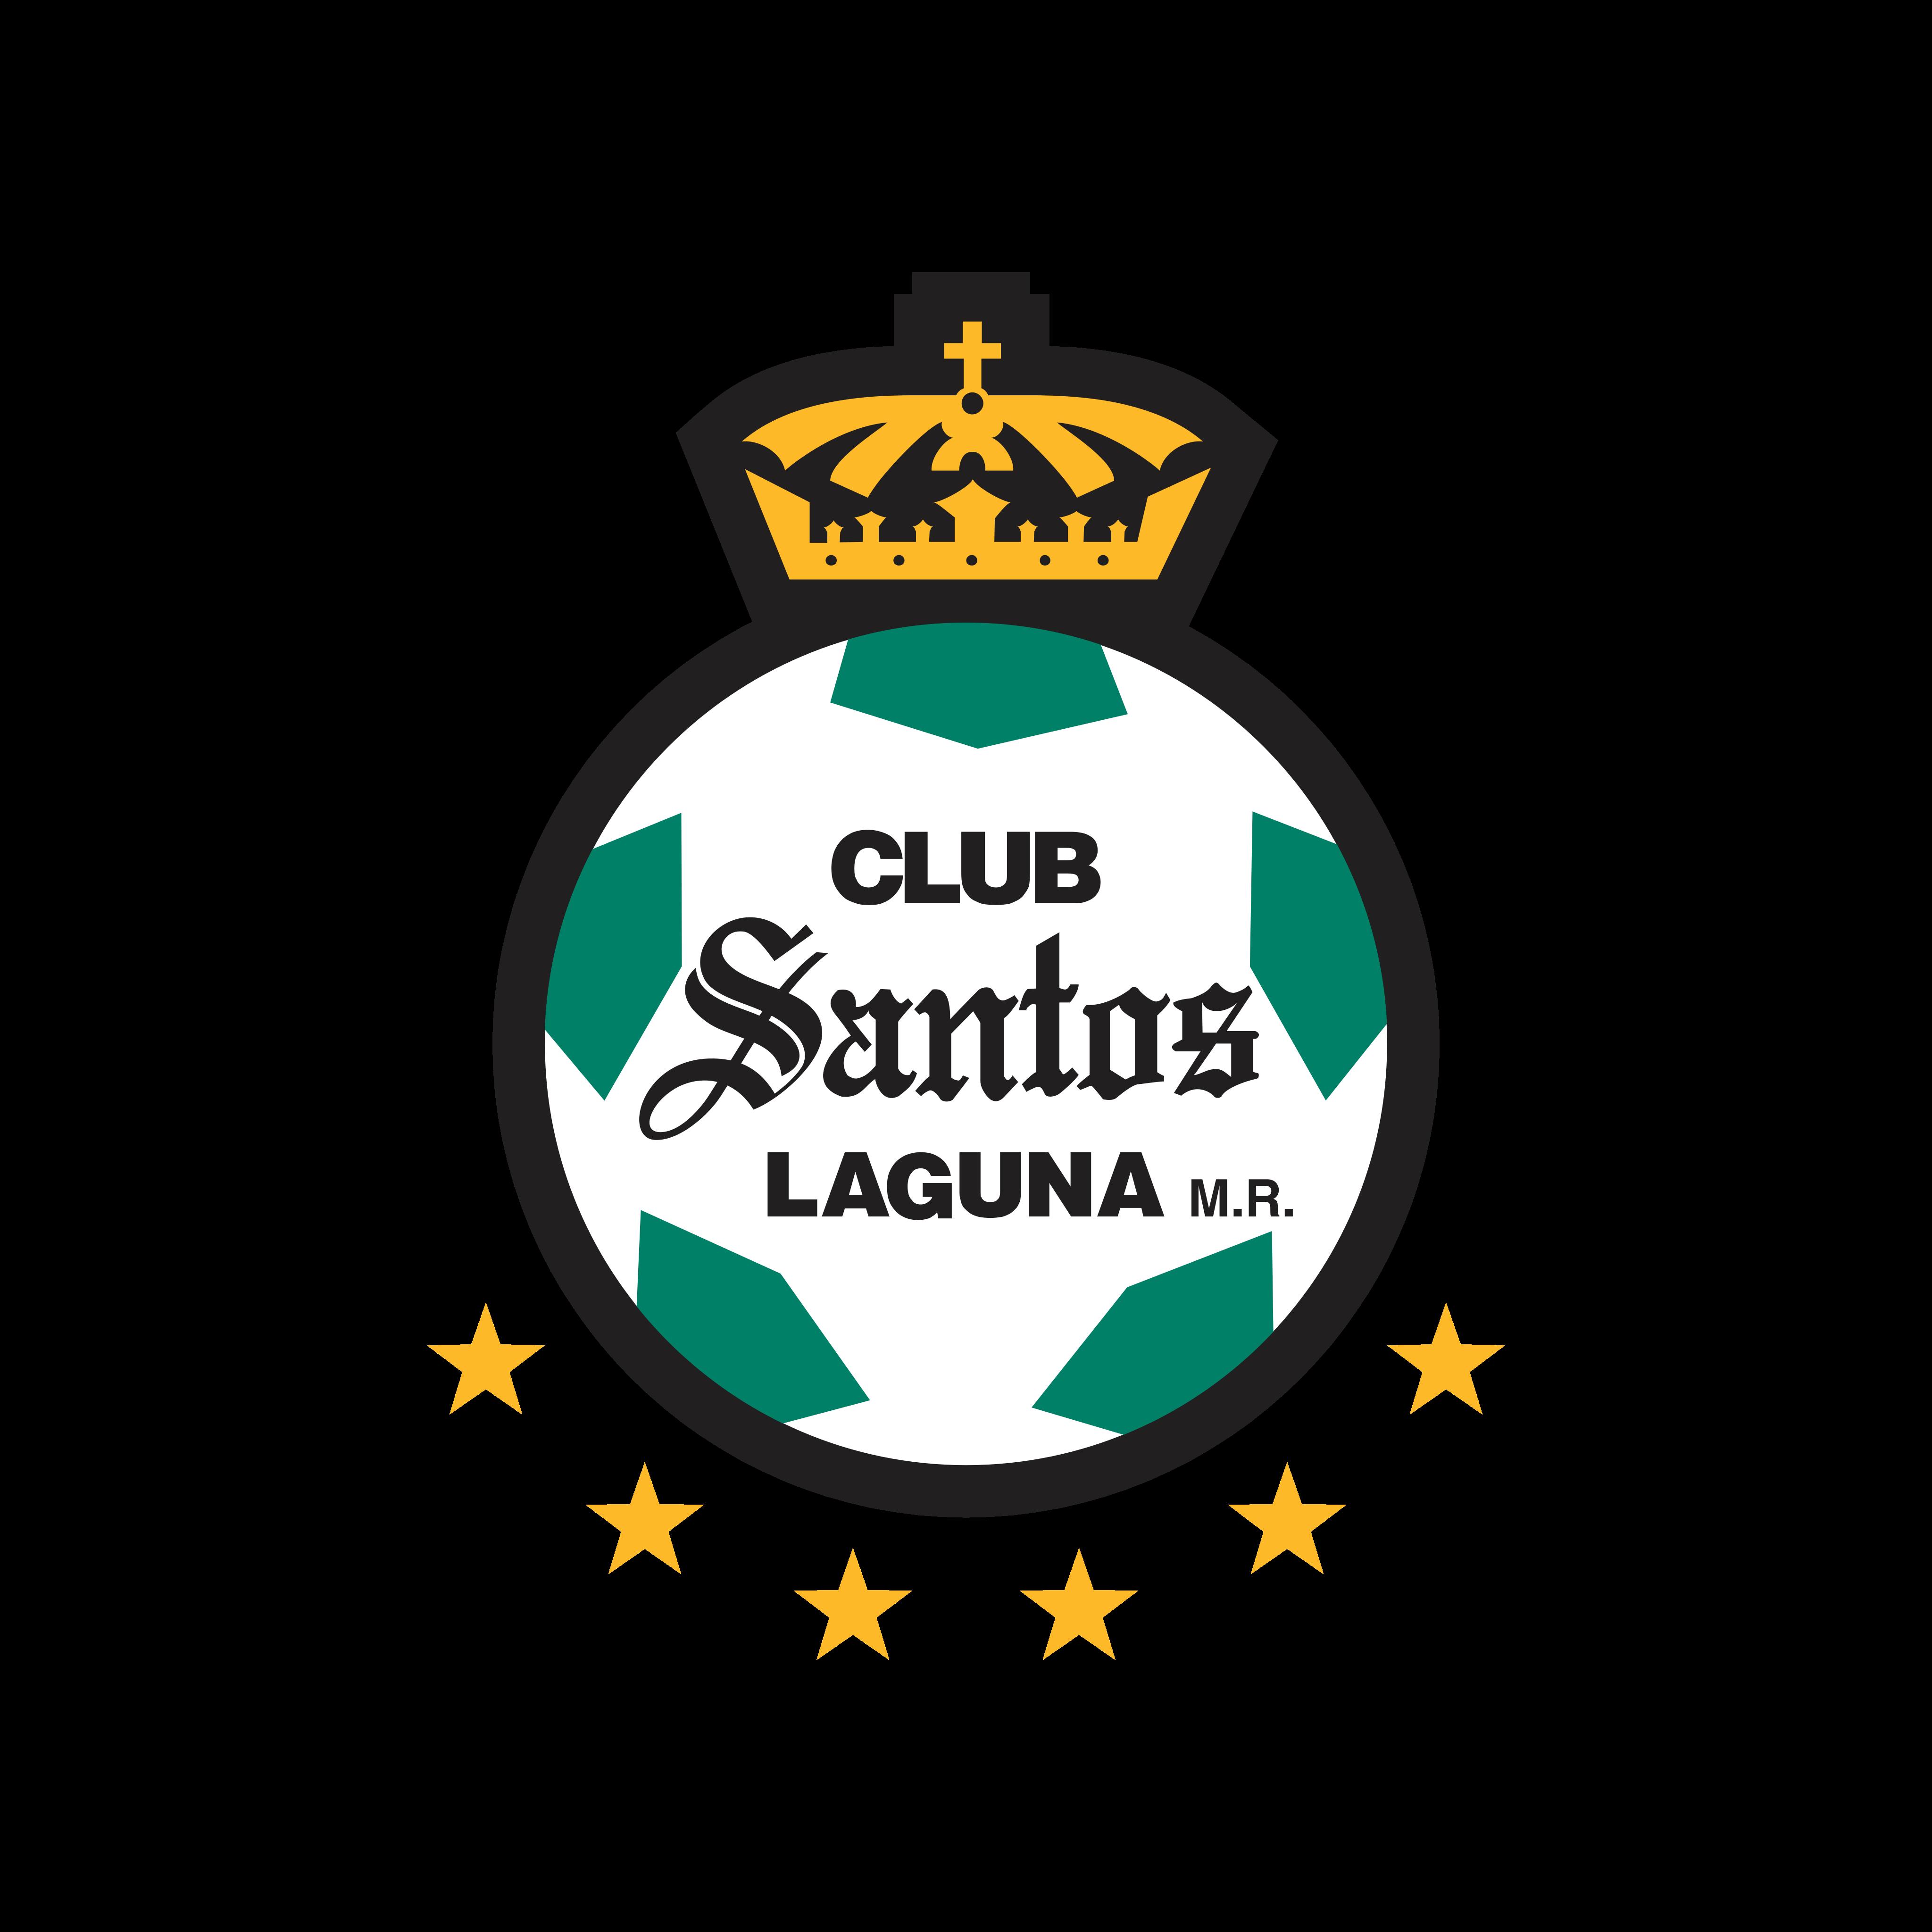 santos laguna logo 0 - Club Santos Laguna Logo - Escudo